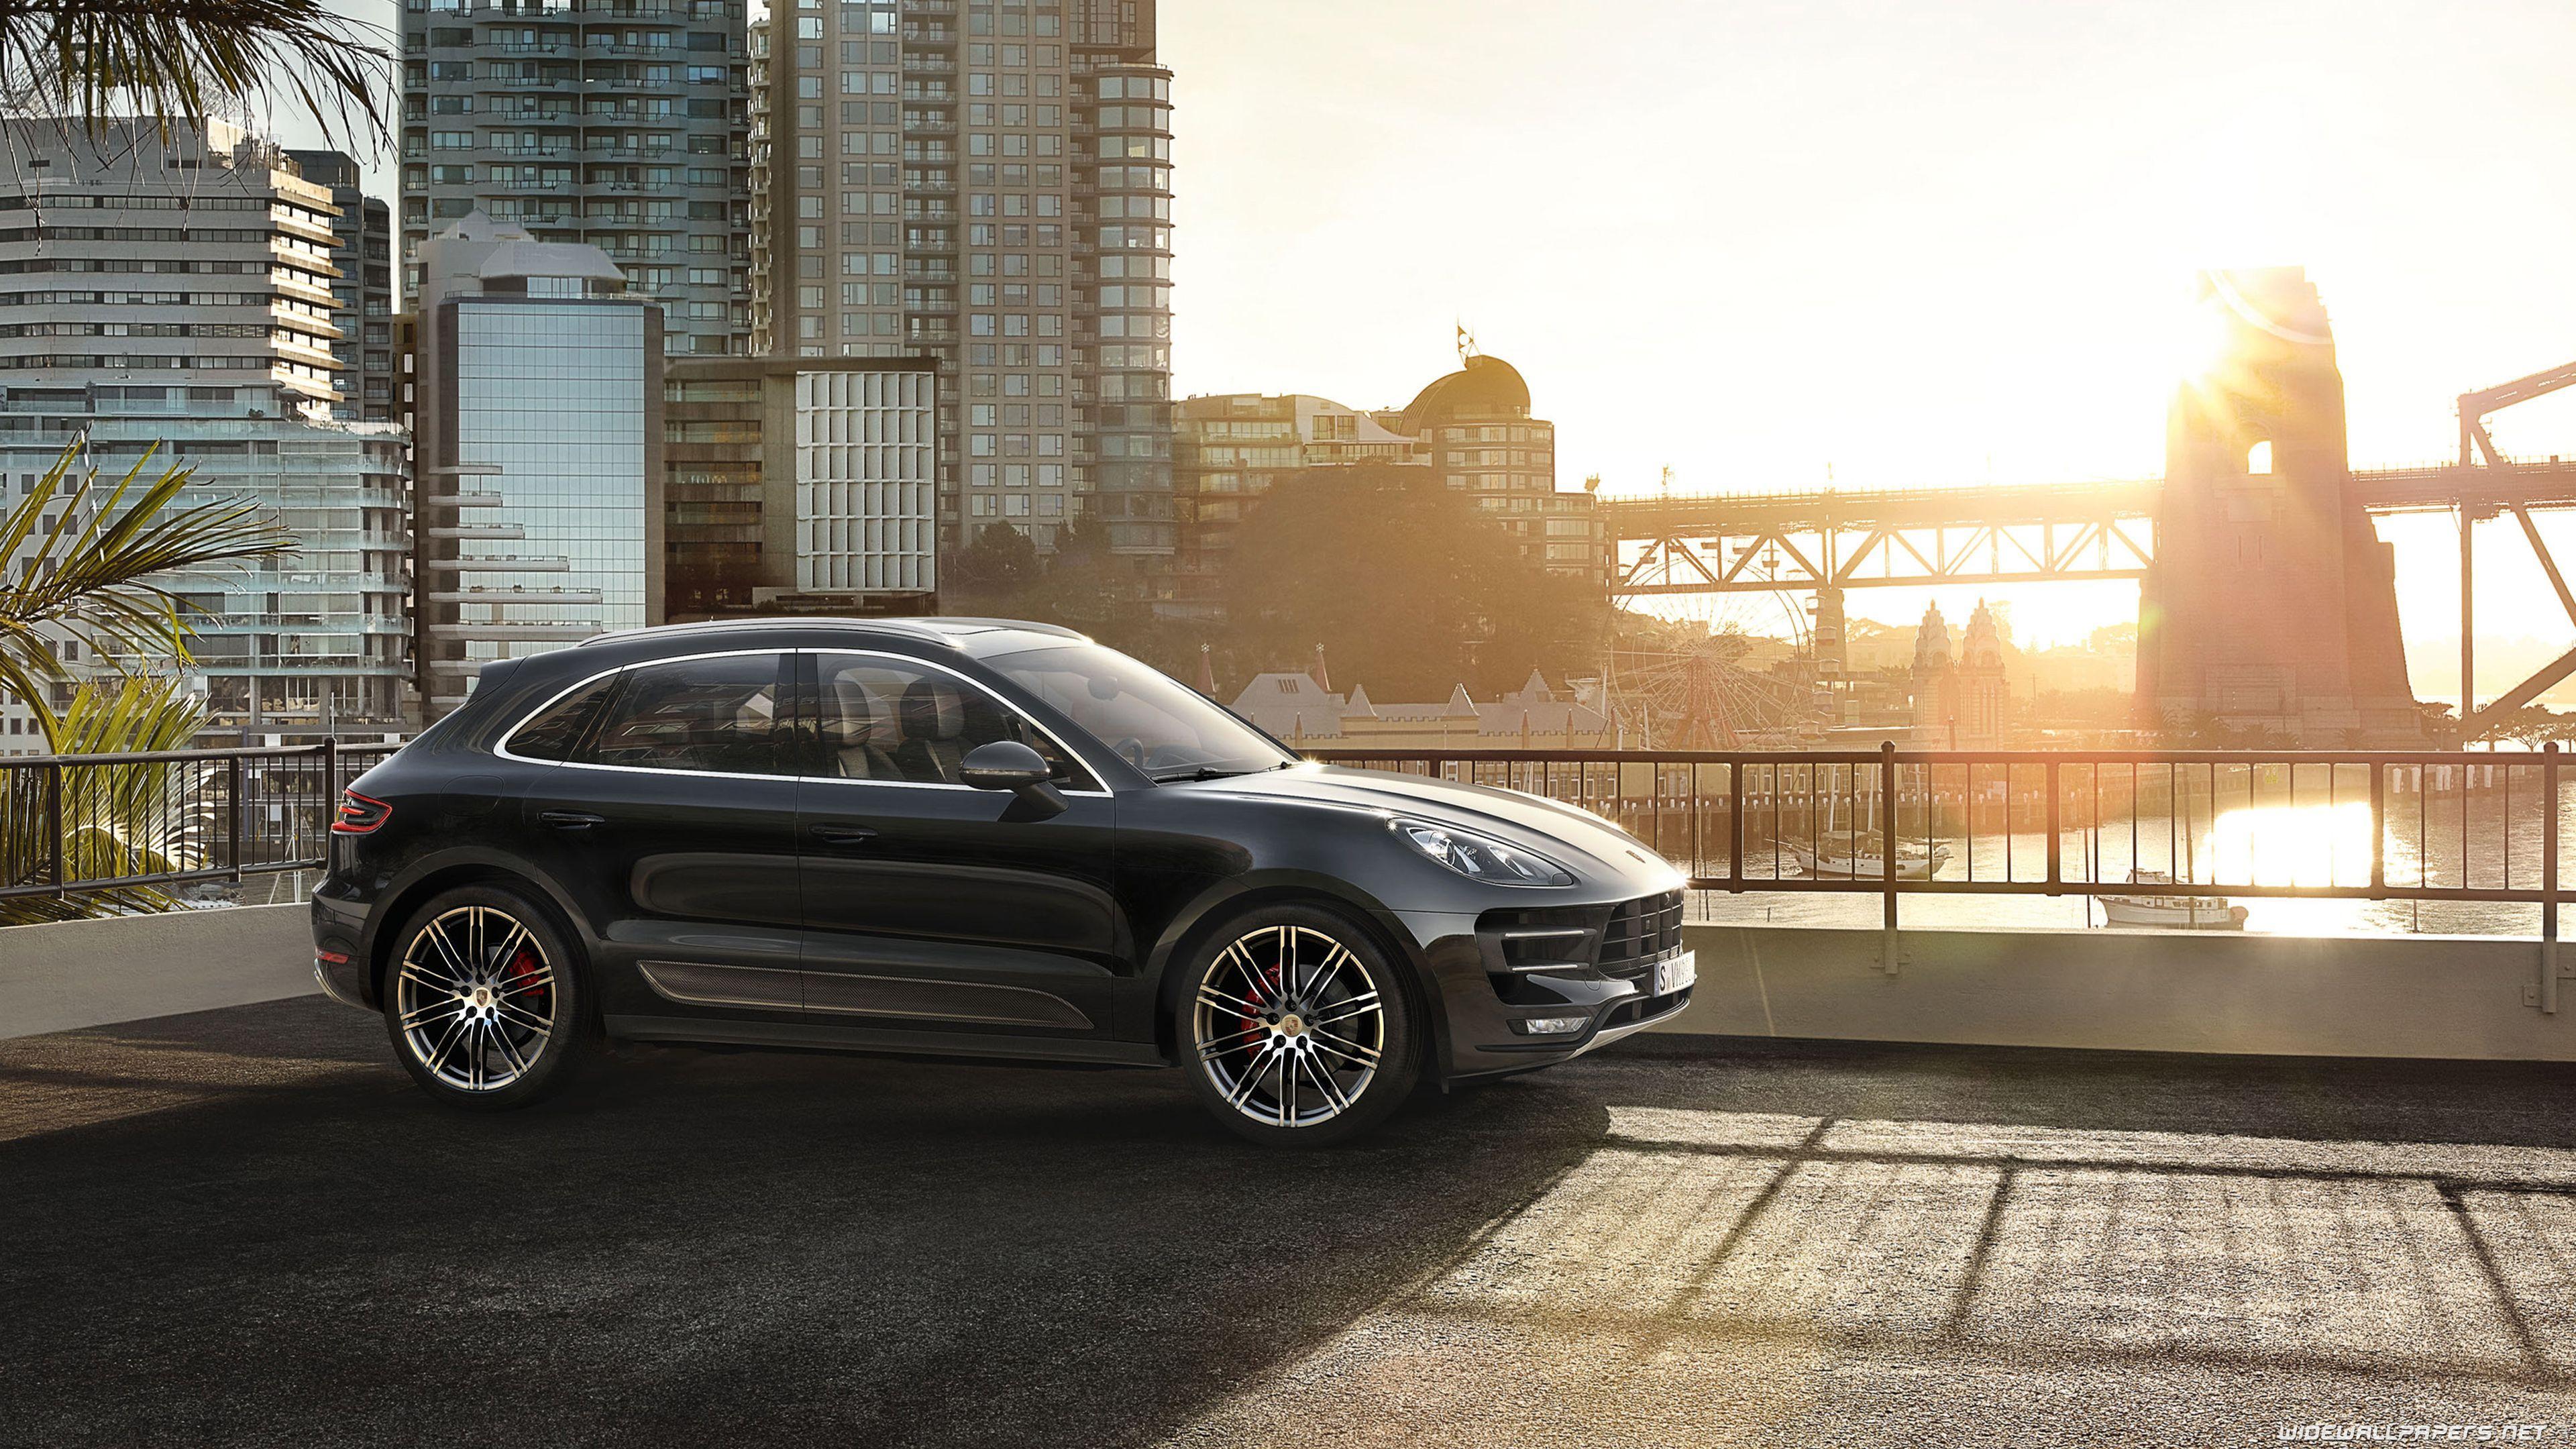 Porsche Macan Wallpapers , Top Free Porsche Macan